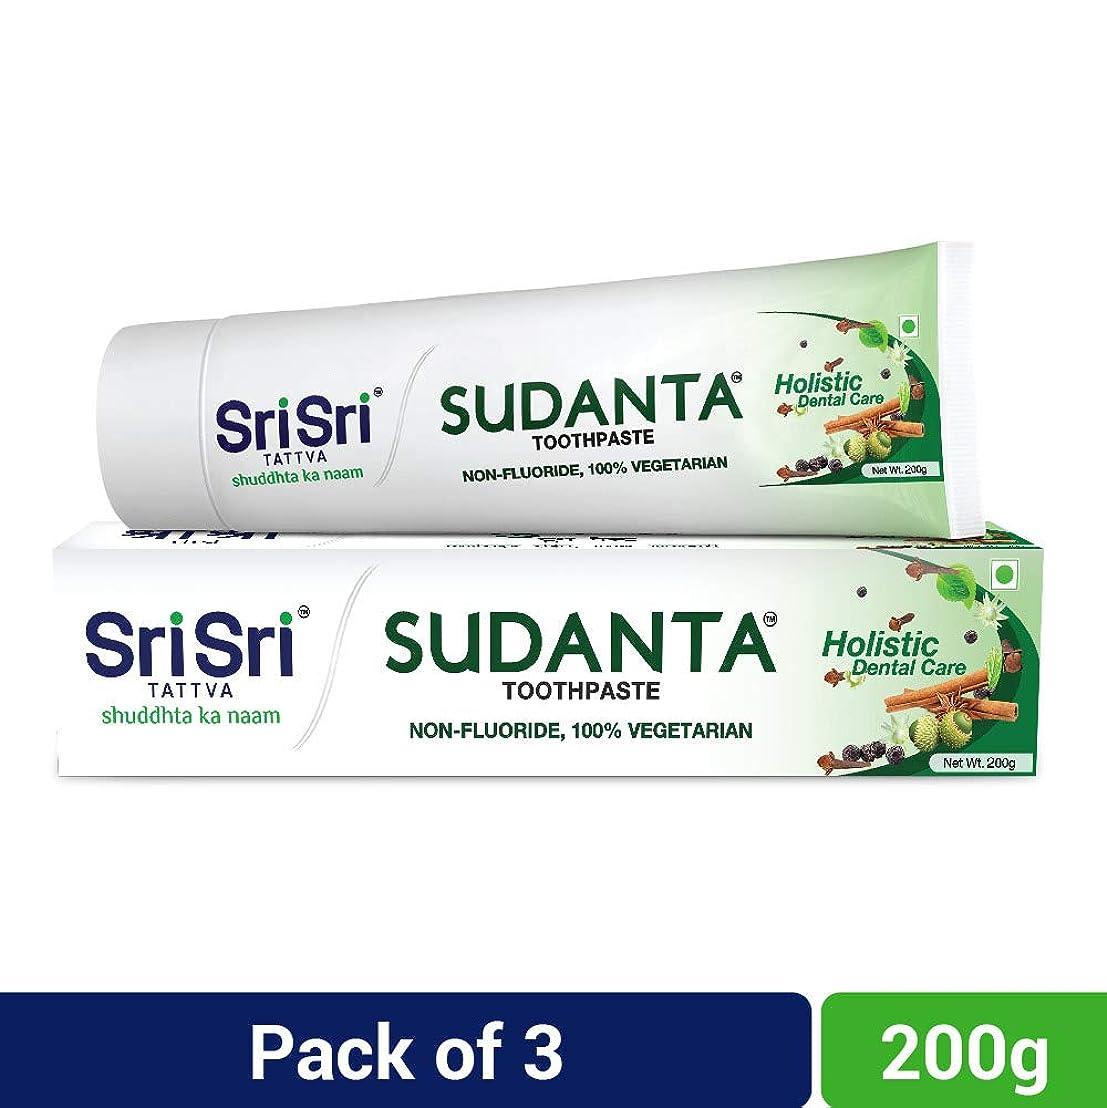 品雄弁家花婿Sri Sri Tattva Sudanta Toothpaste, 600gm (200gm x Pack of 3)